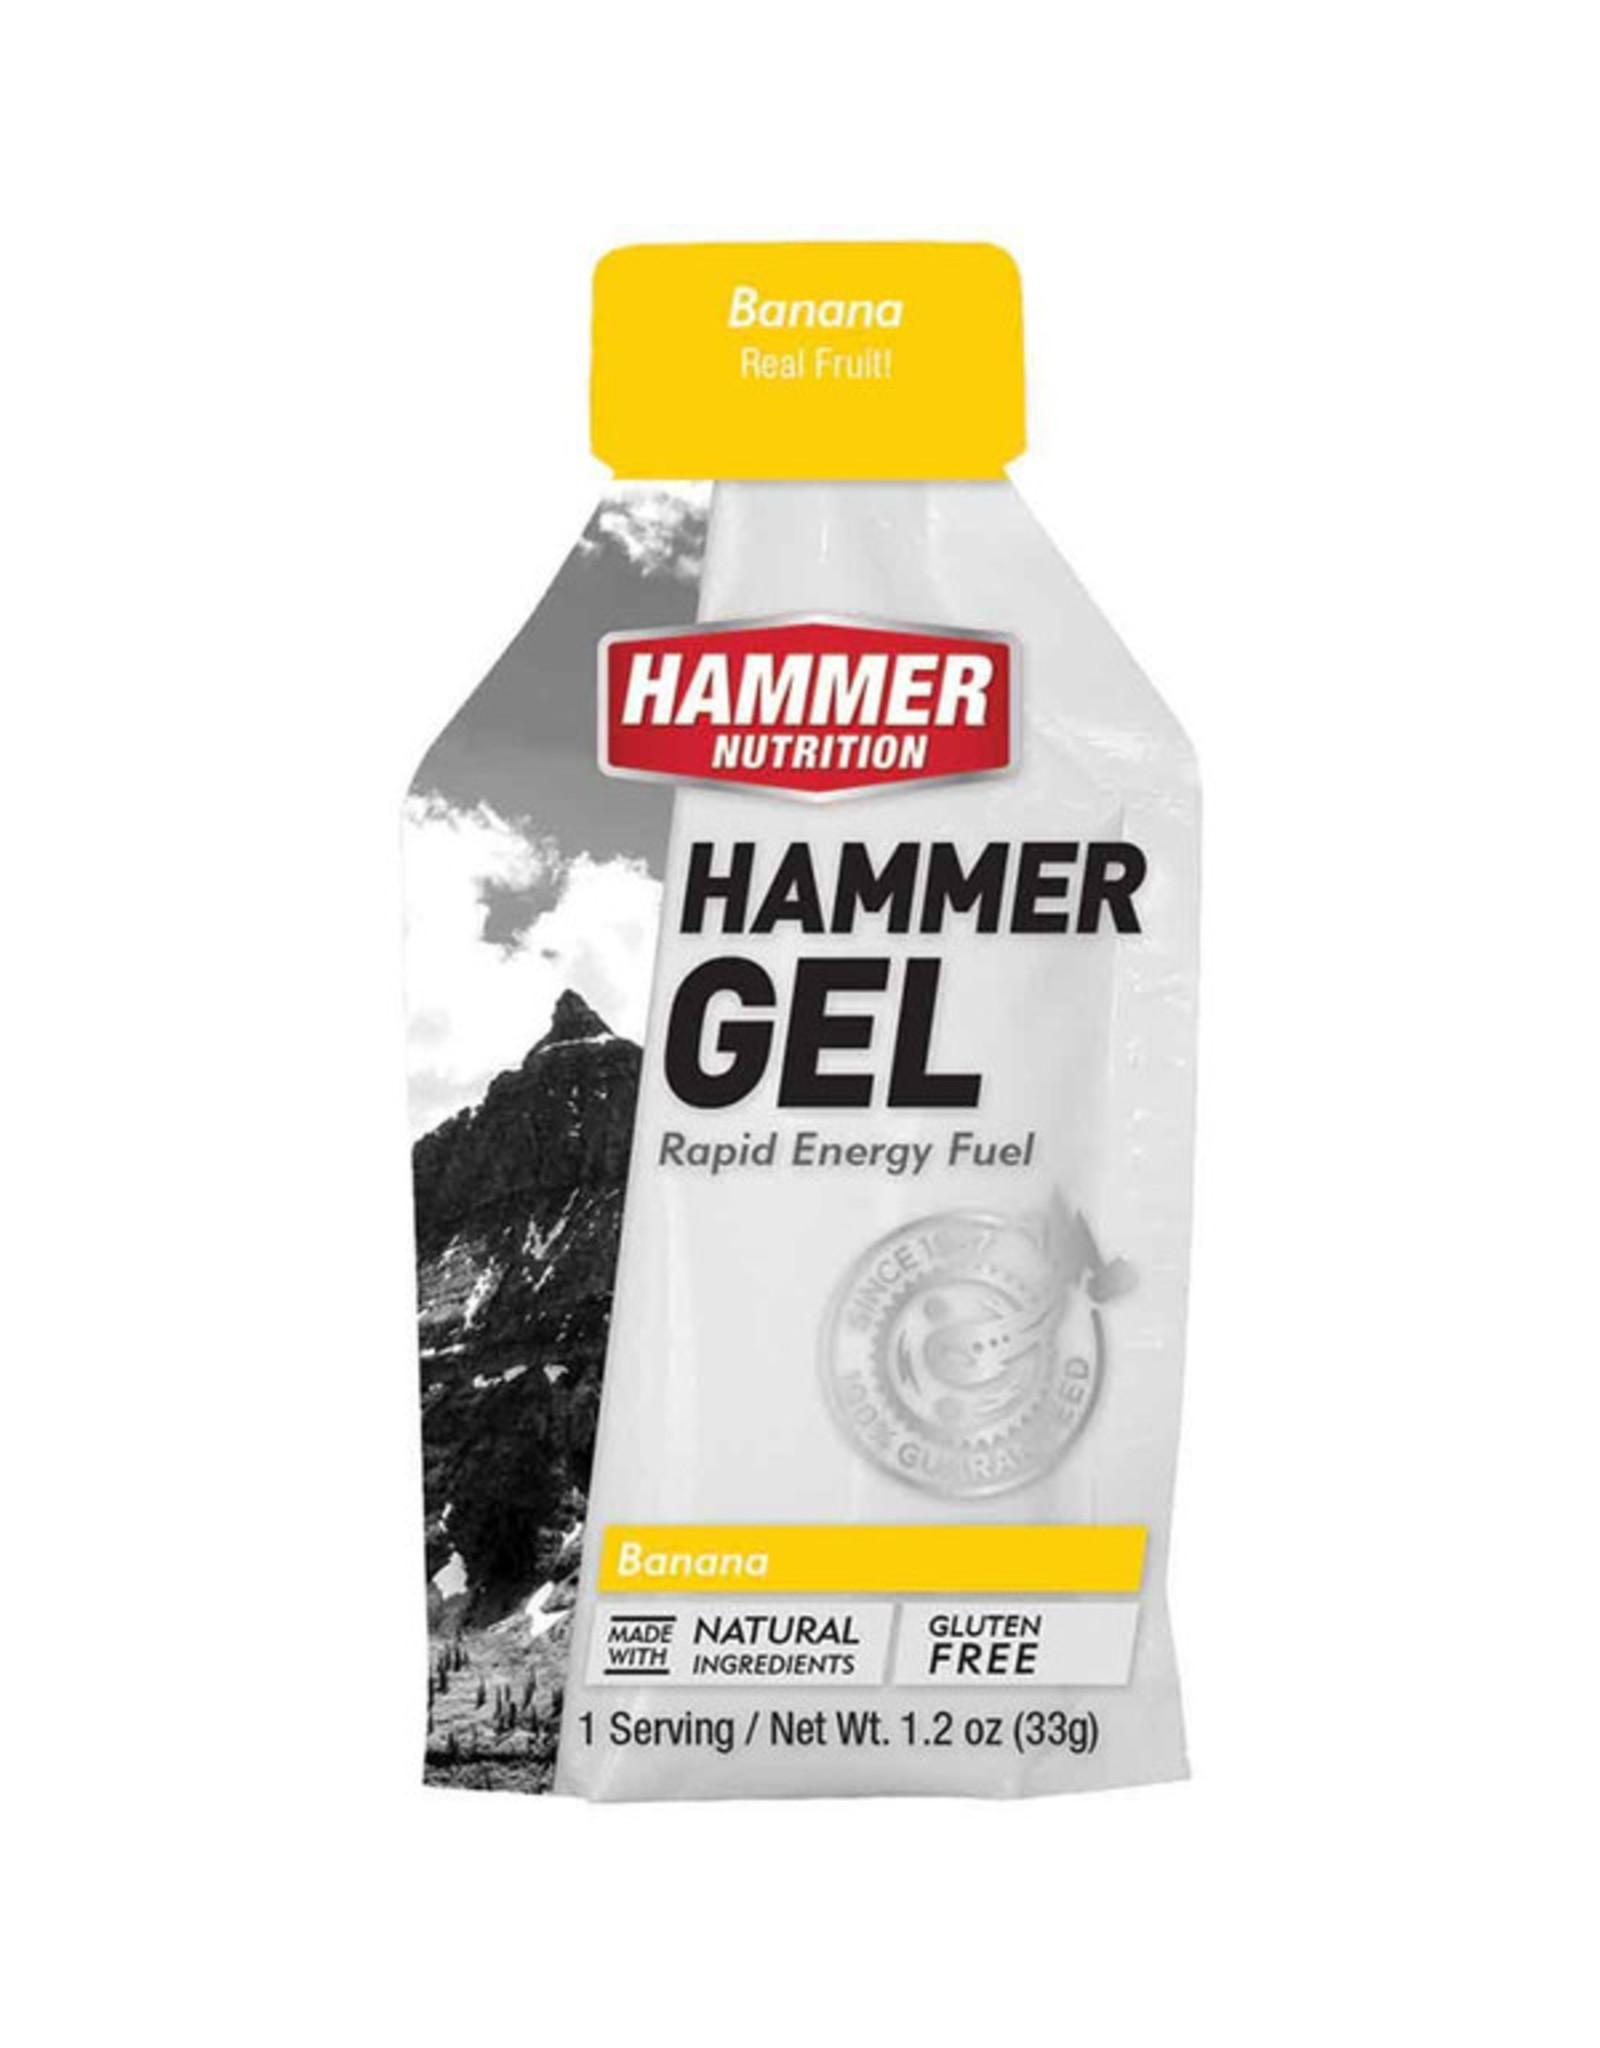 Hammer Nutrition Hammer Nutrition Hammer Gel 24 Pack